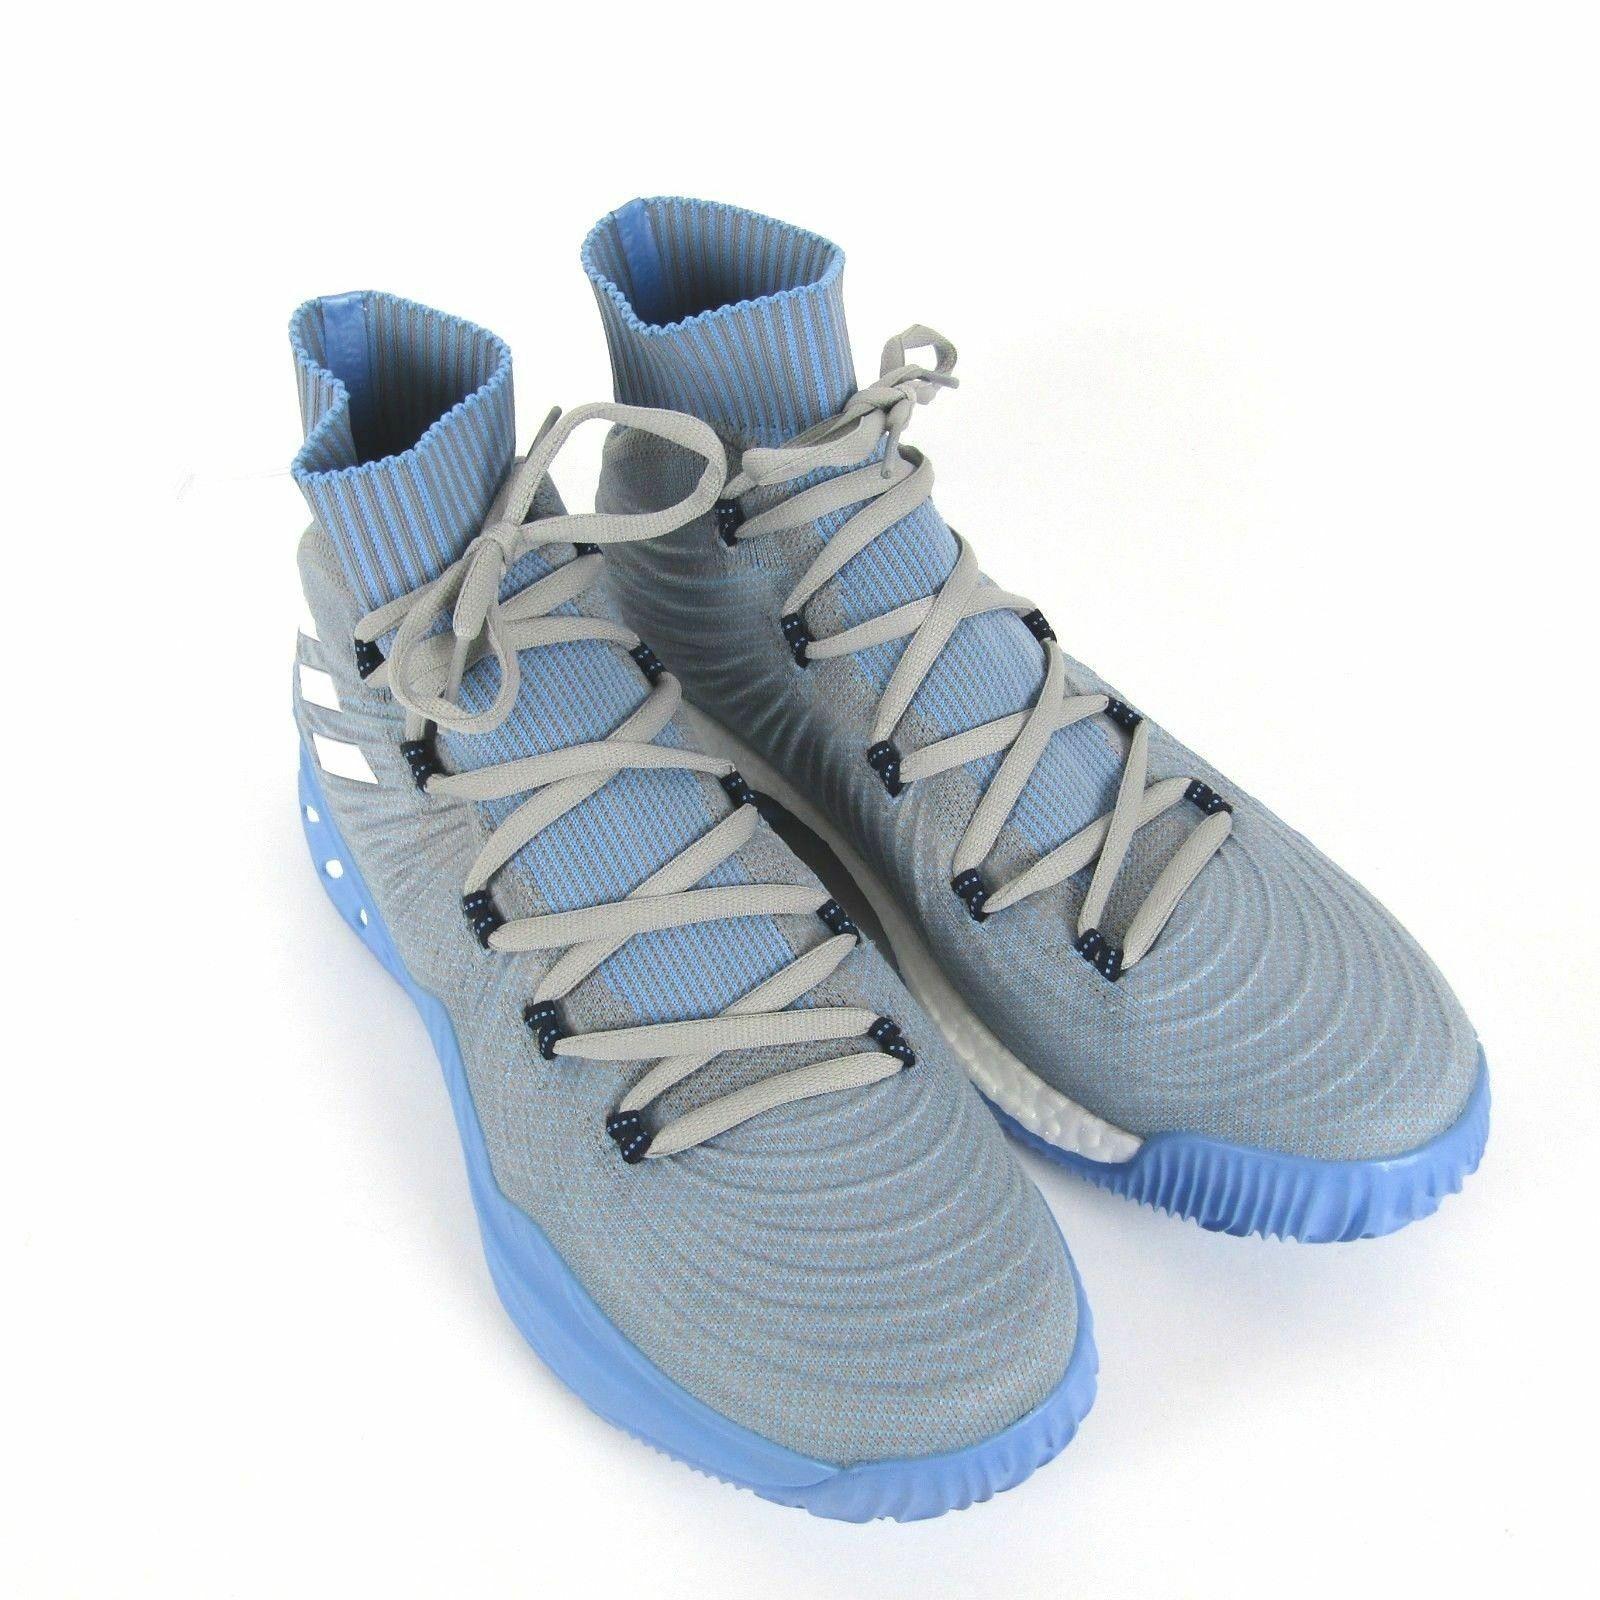 Adidas Crazy Esplosiva Primeknit Kenneth Sonia Ferrari Pe Pepite Nets AC8724